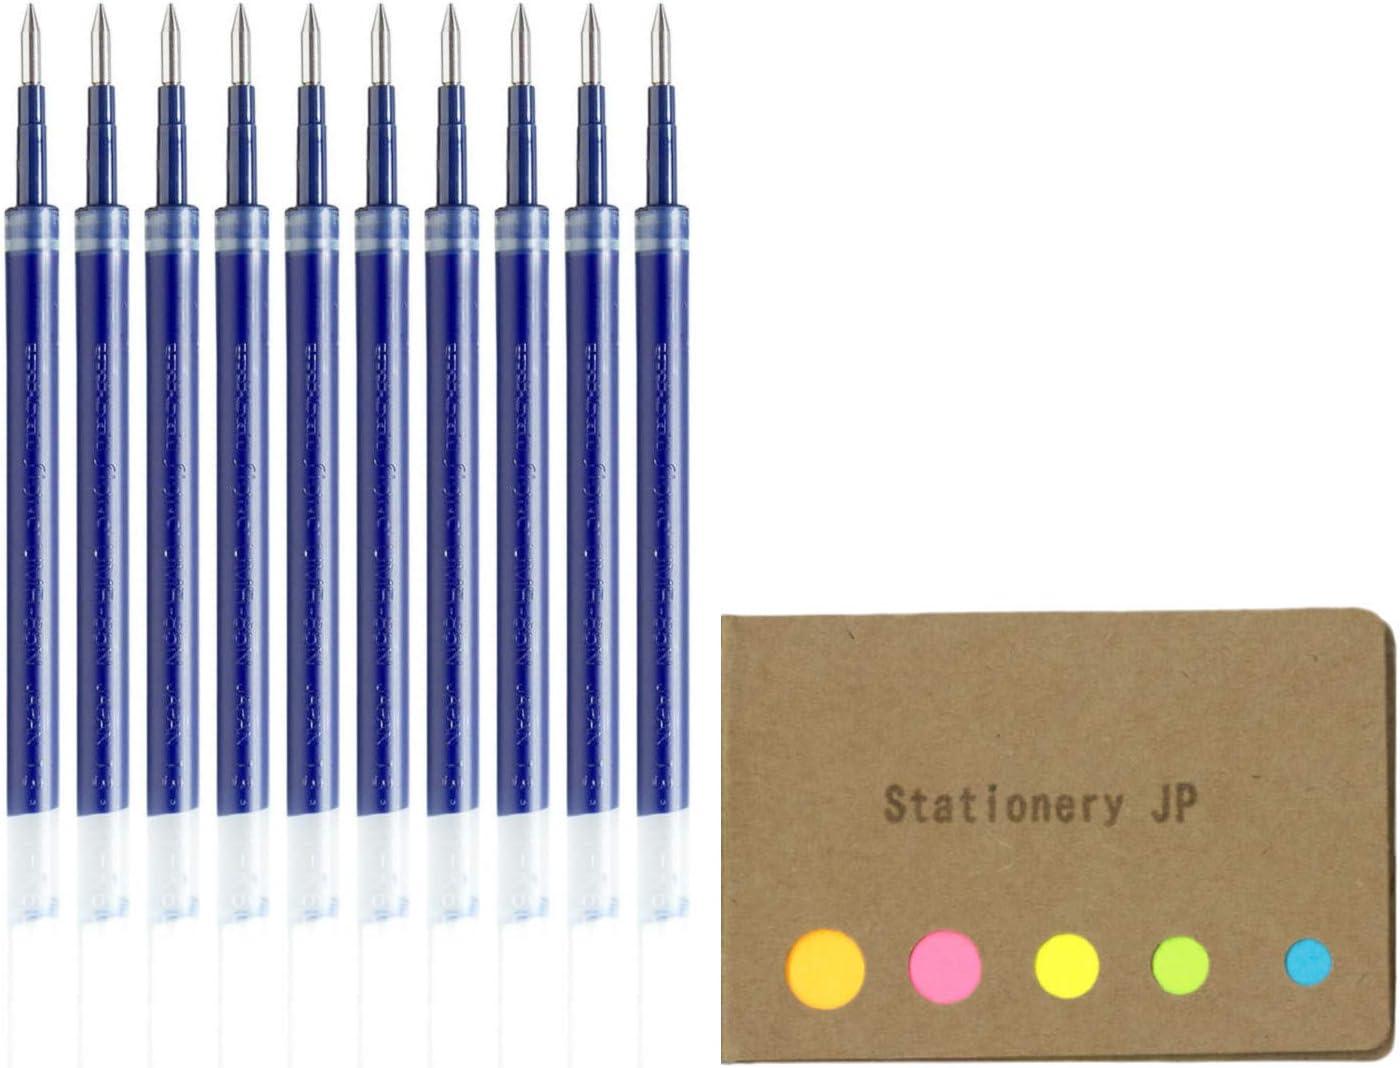 Gullor Slim rollerball pen 801 golden clip Macular